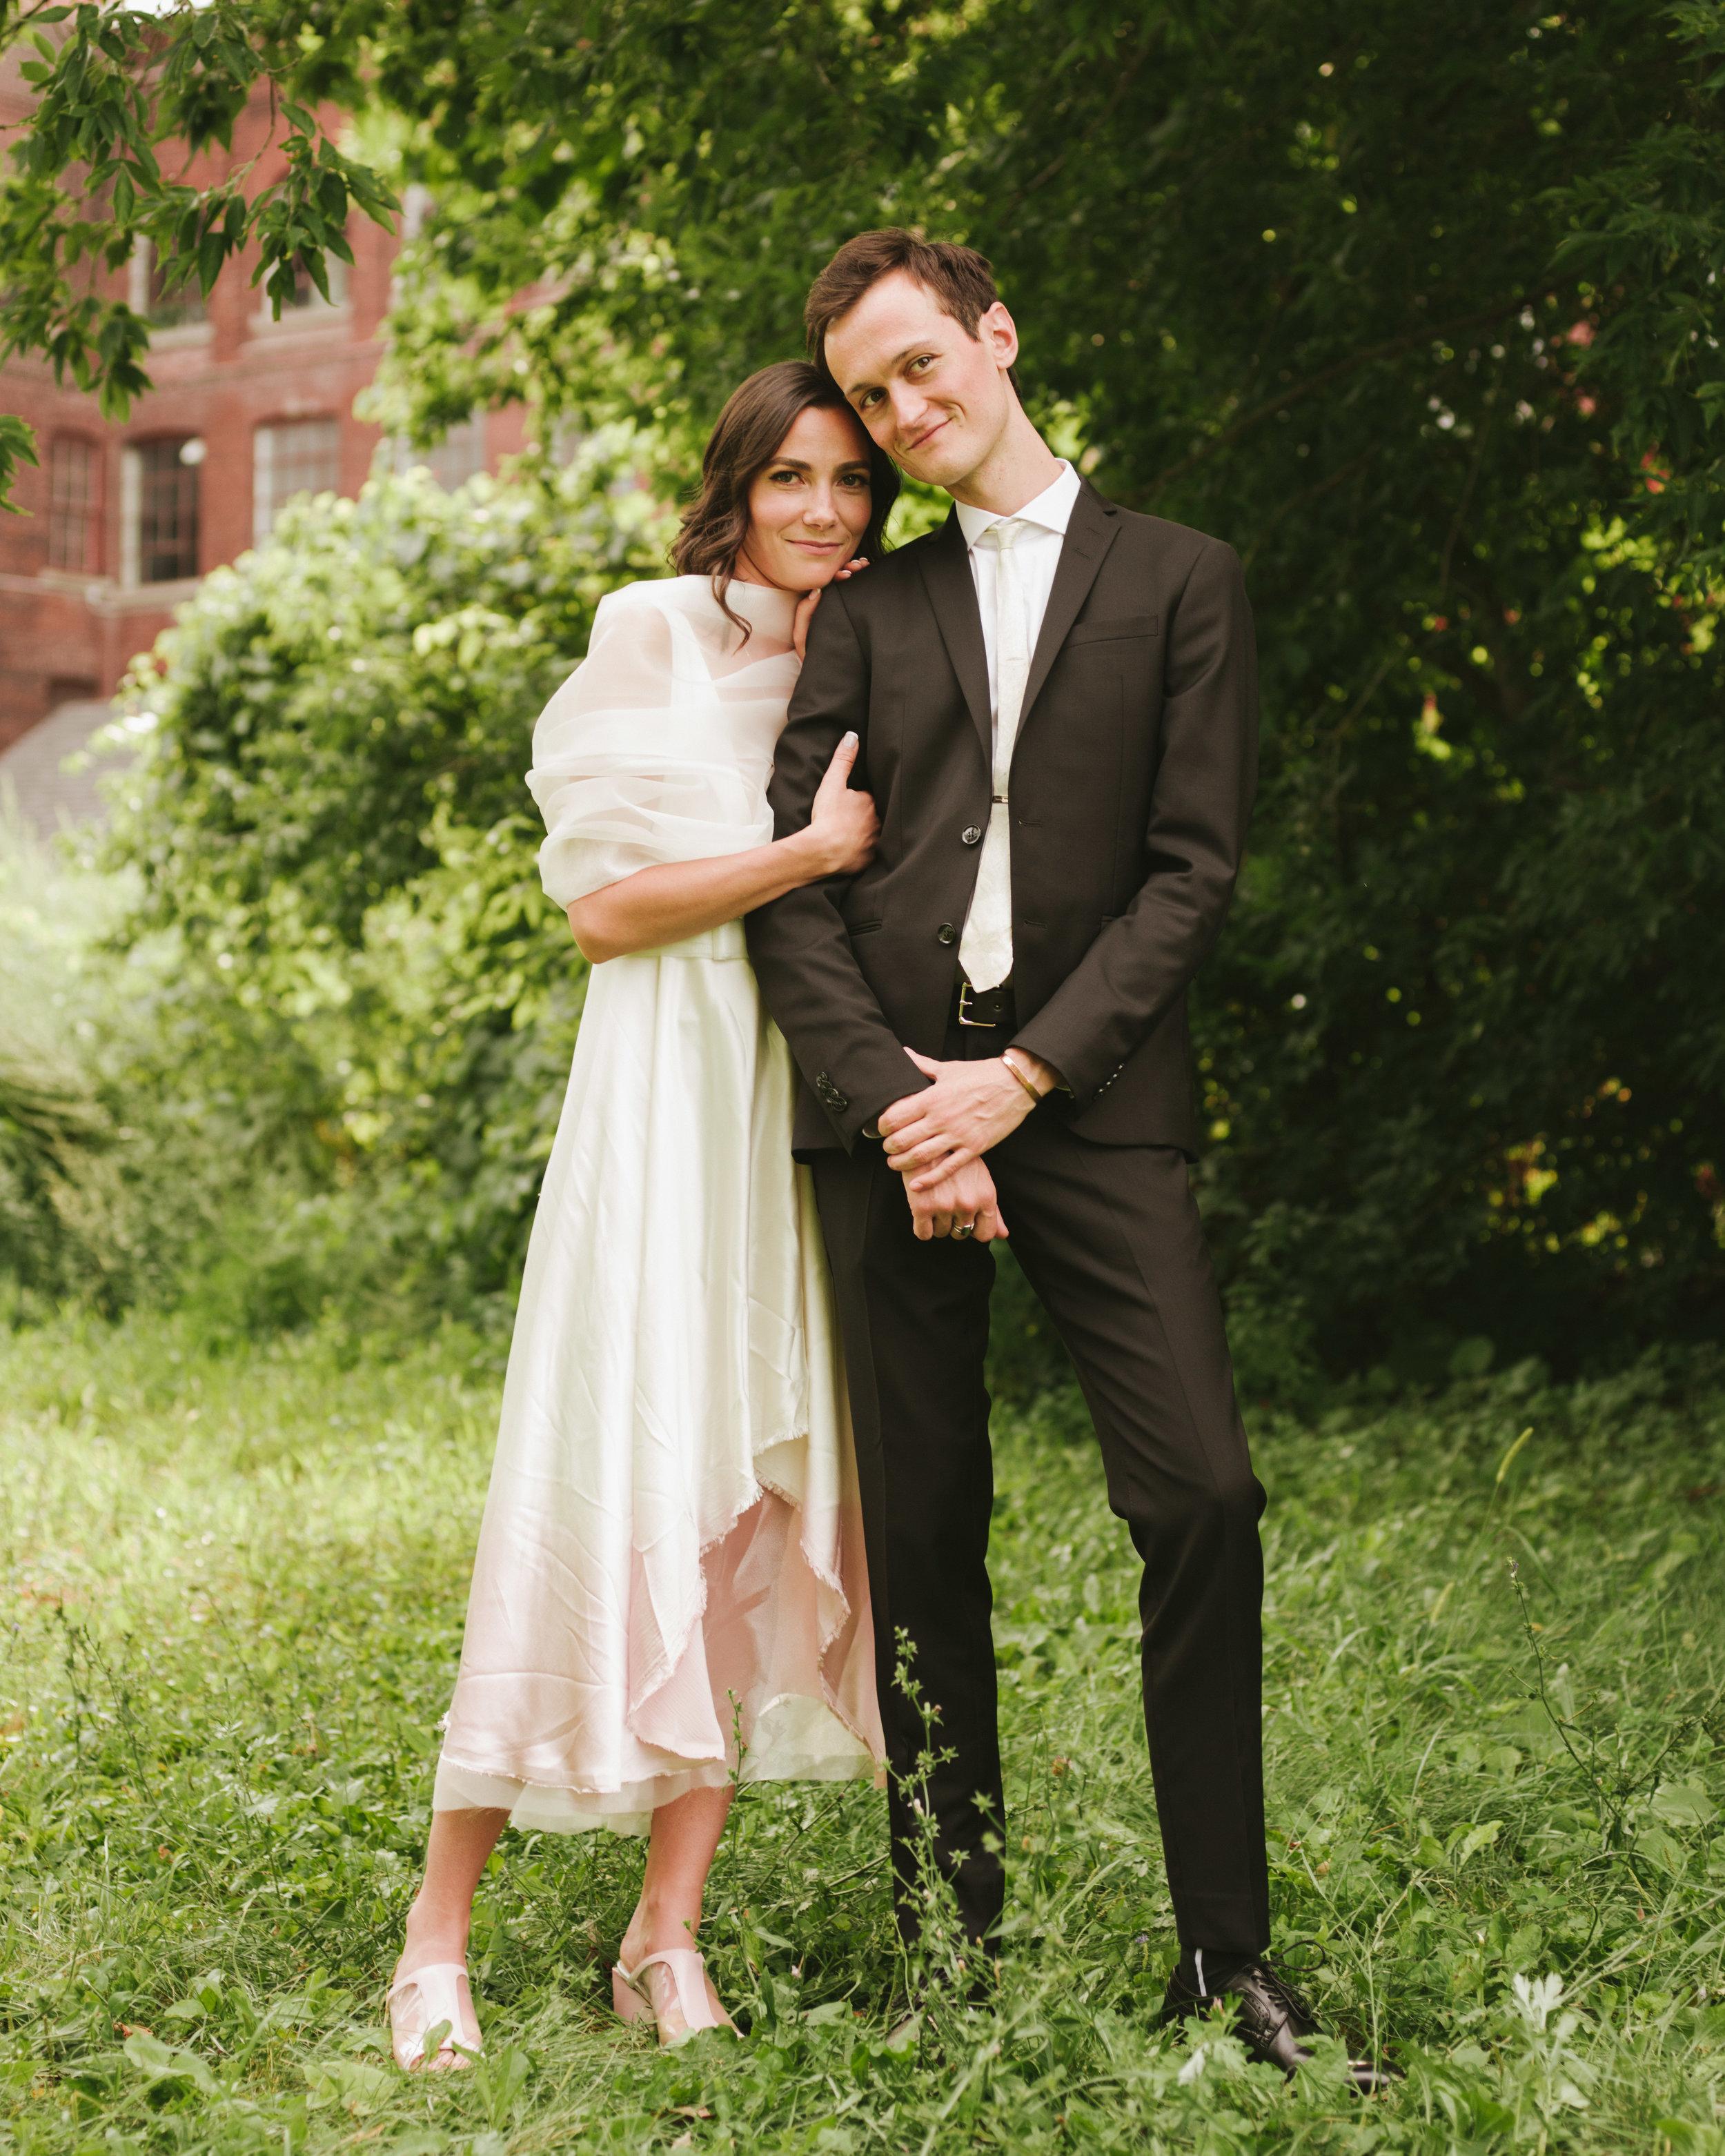 Tim-Darcy_Amy-Fort_Wedding_2019-9584.jpg